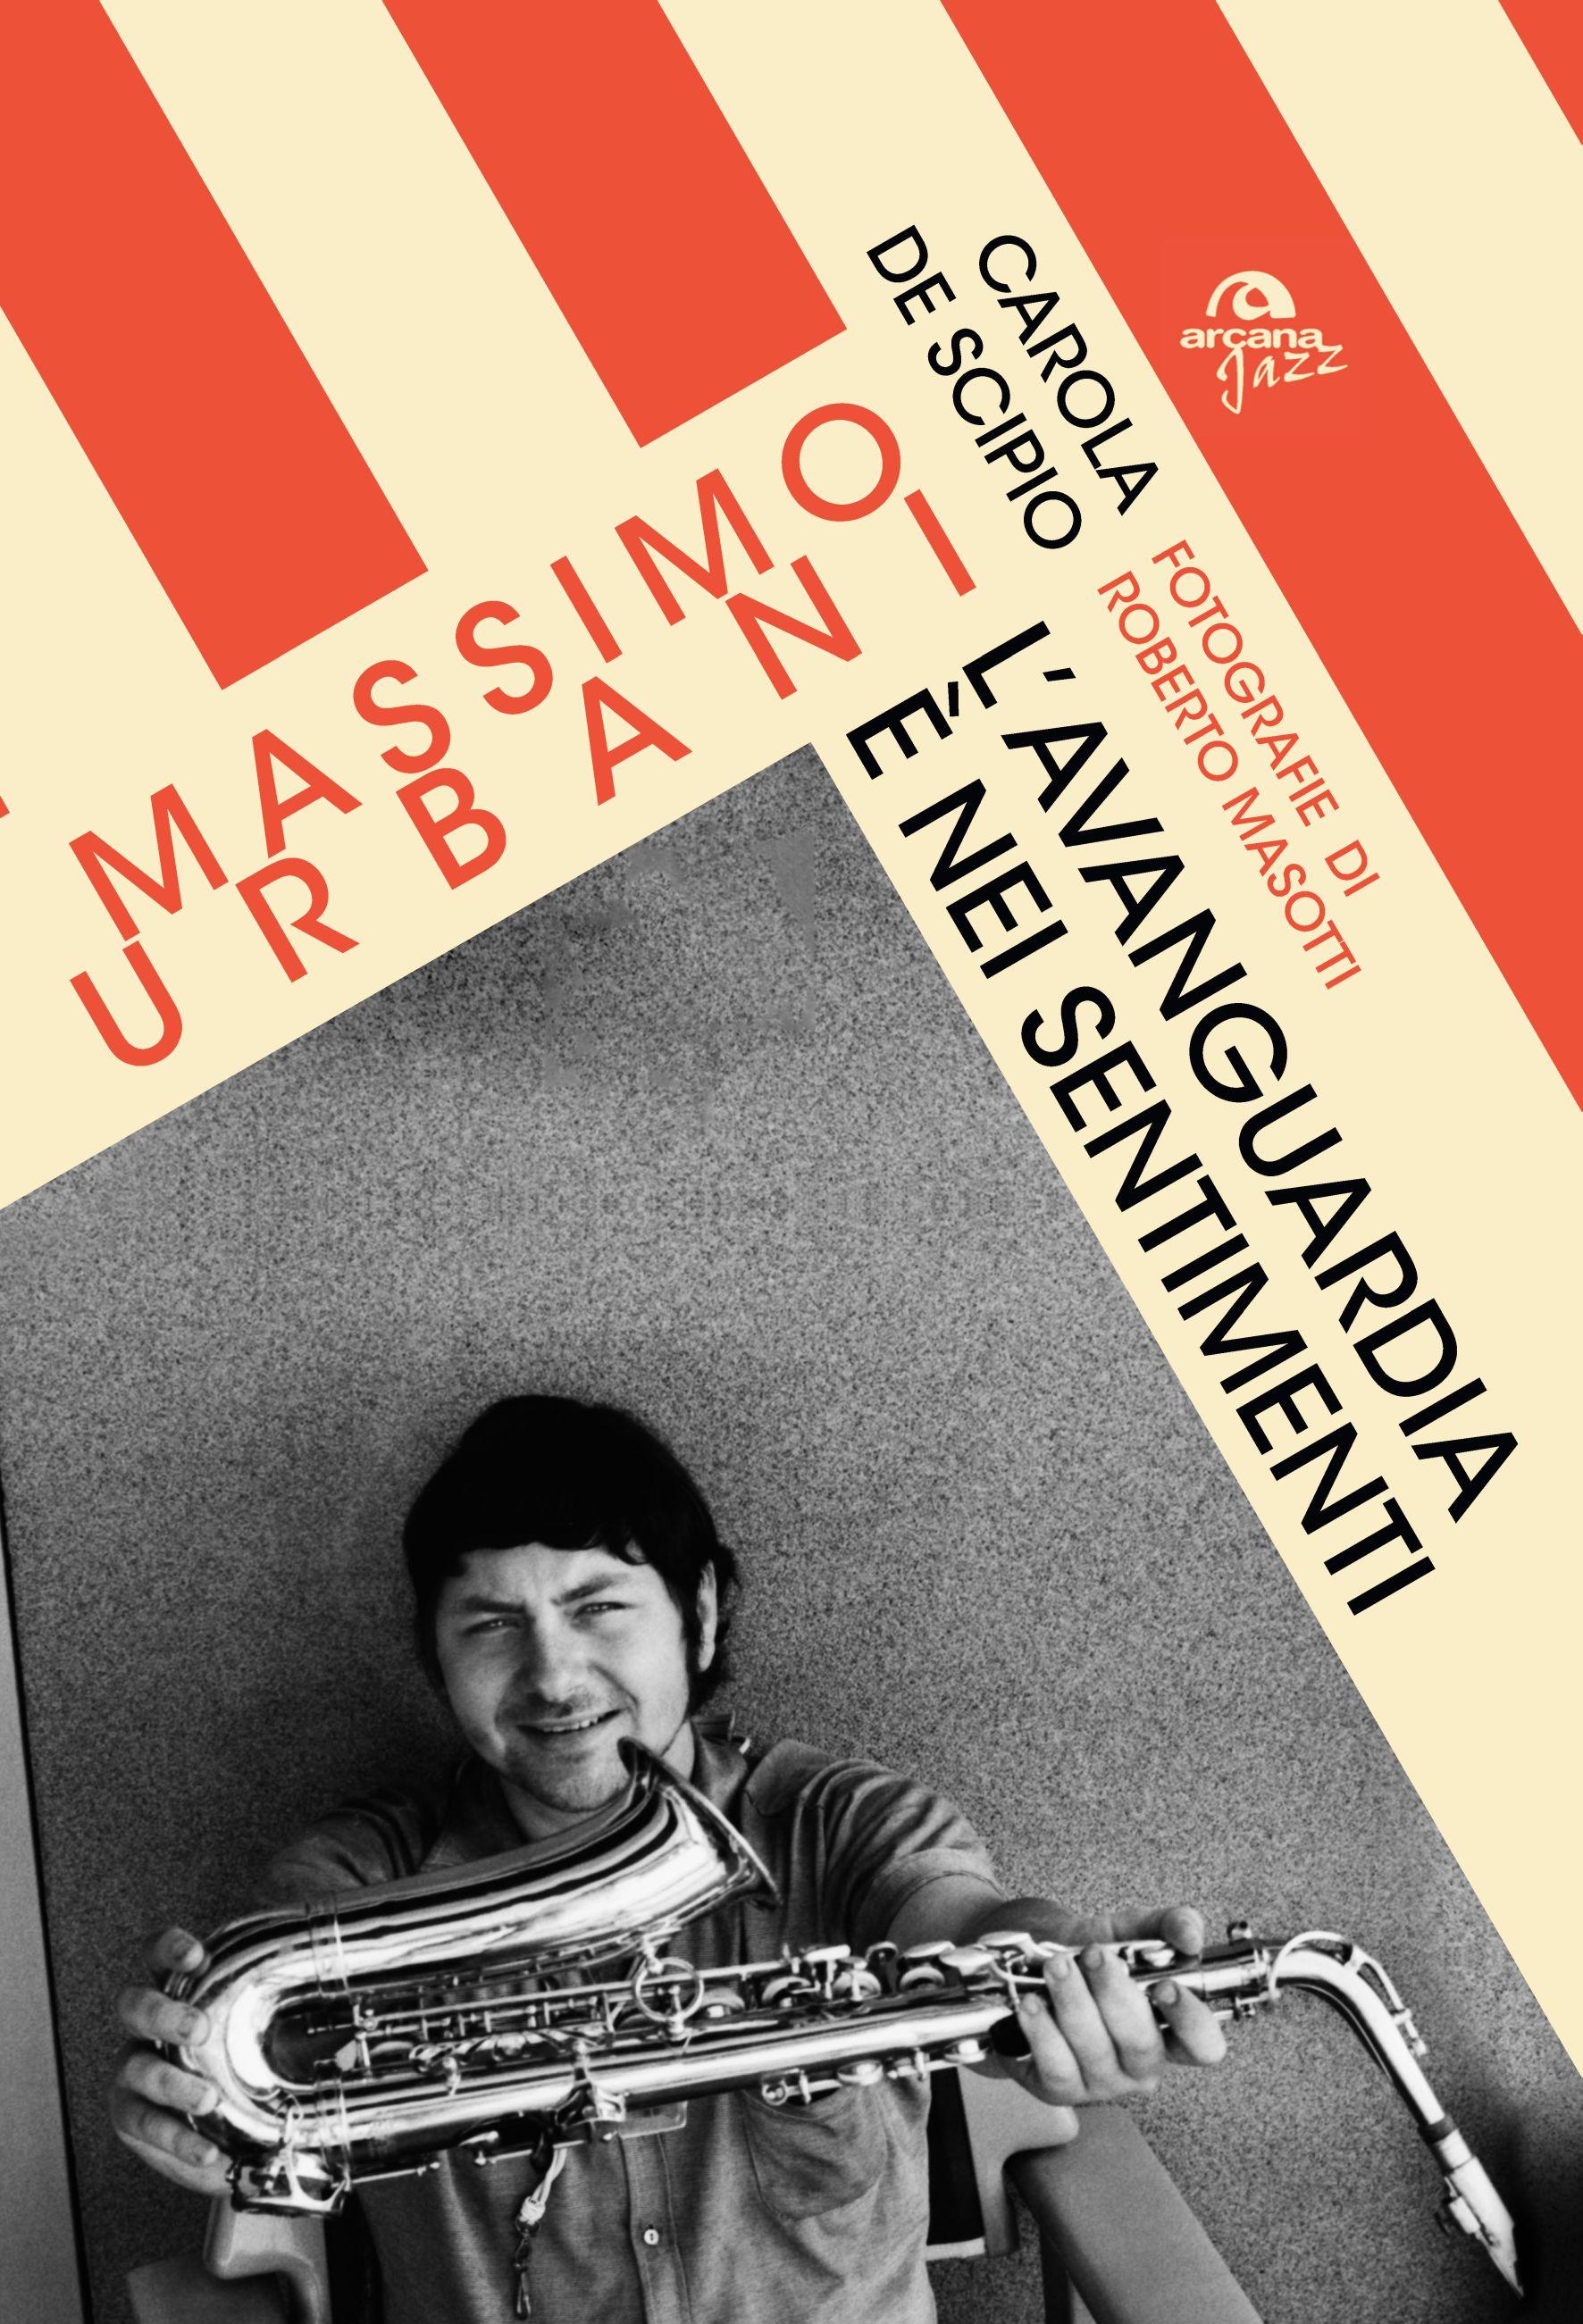 Massimo Urbani